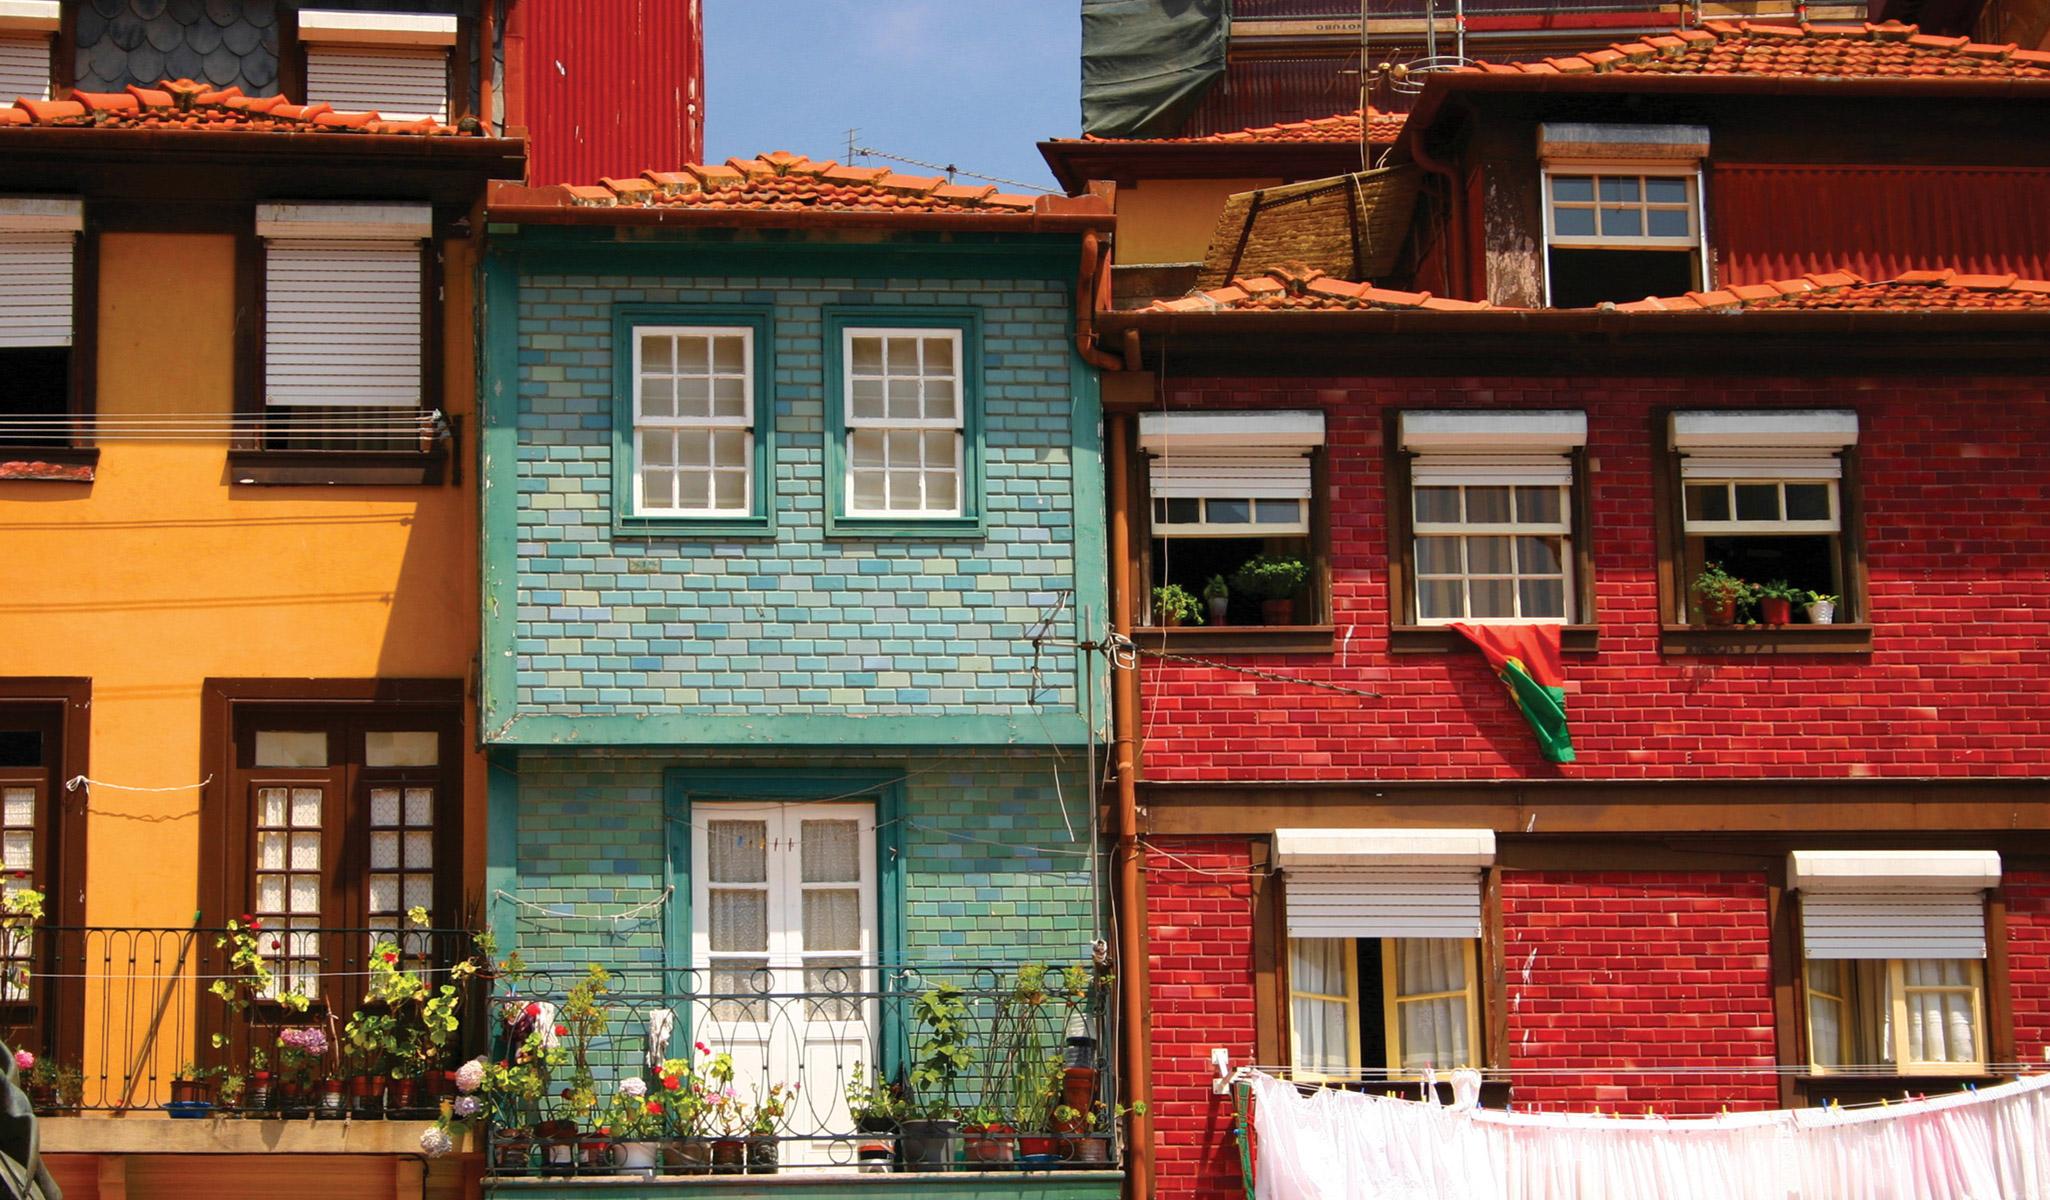 maison close au portugal ventana blog. Black Bedroom Furniture Sets. Home Design Ideas